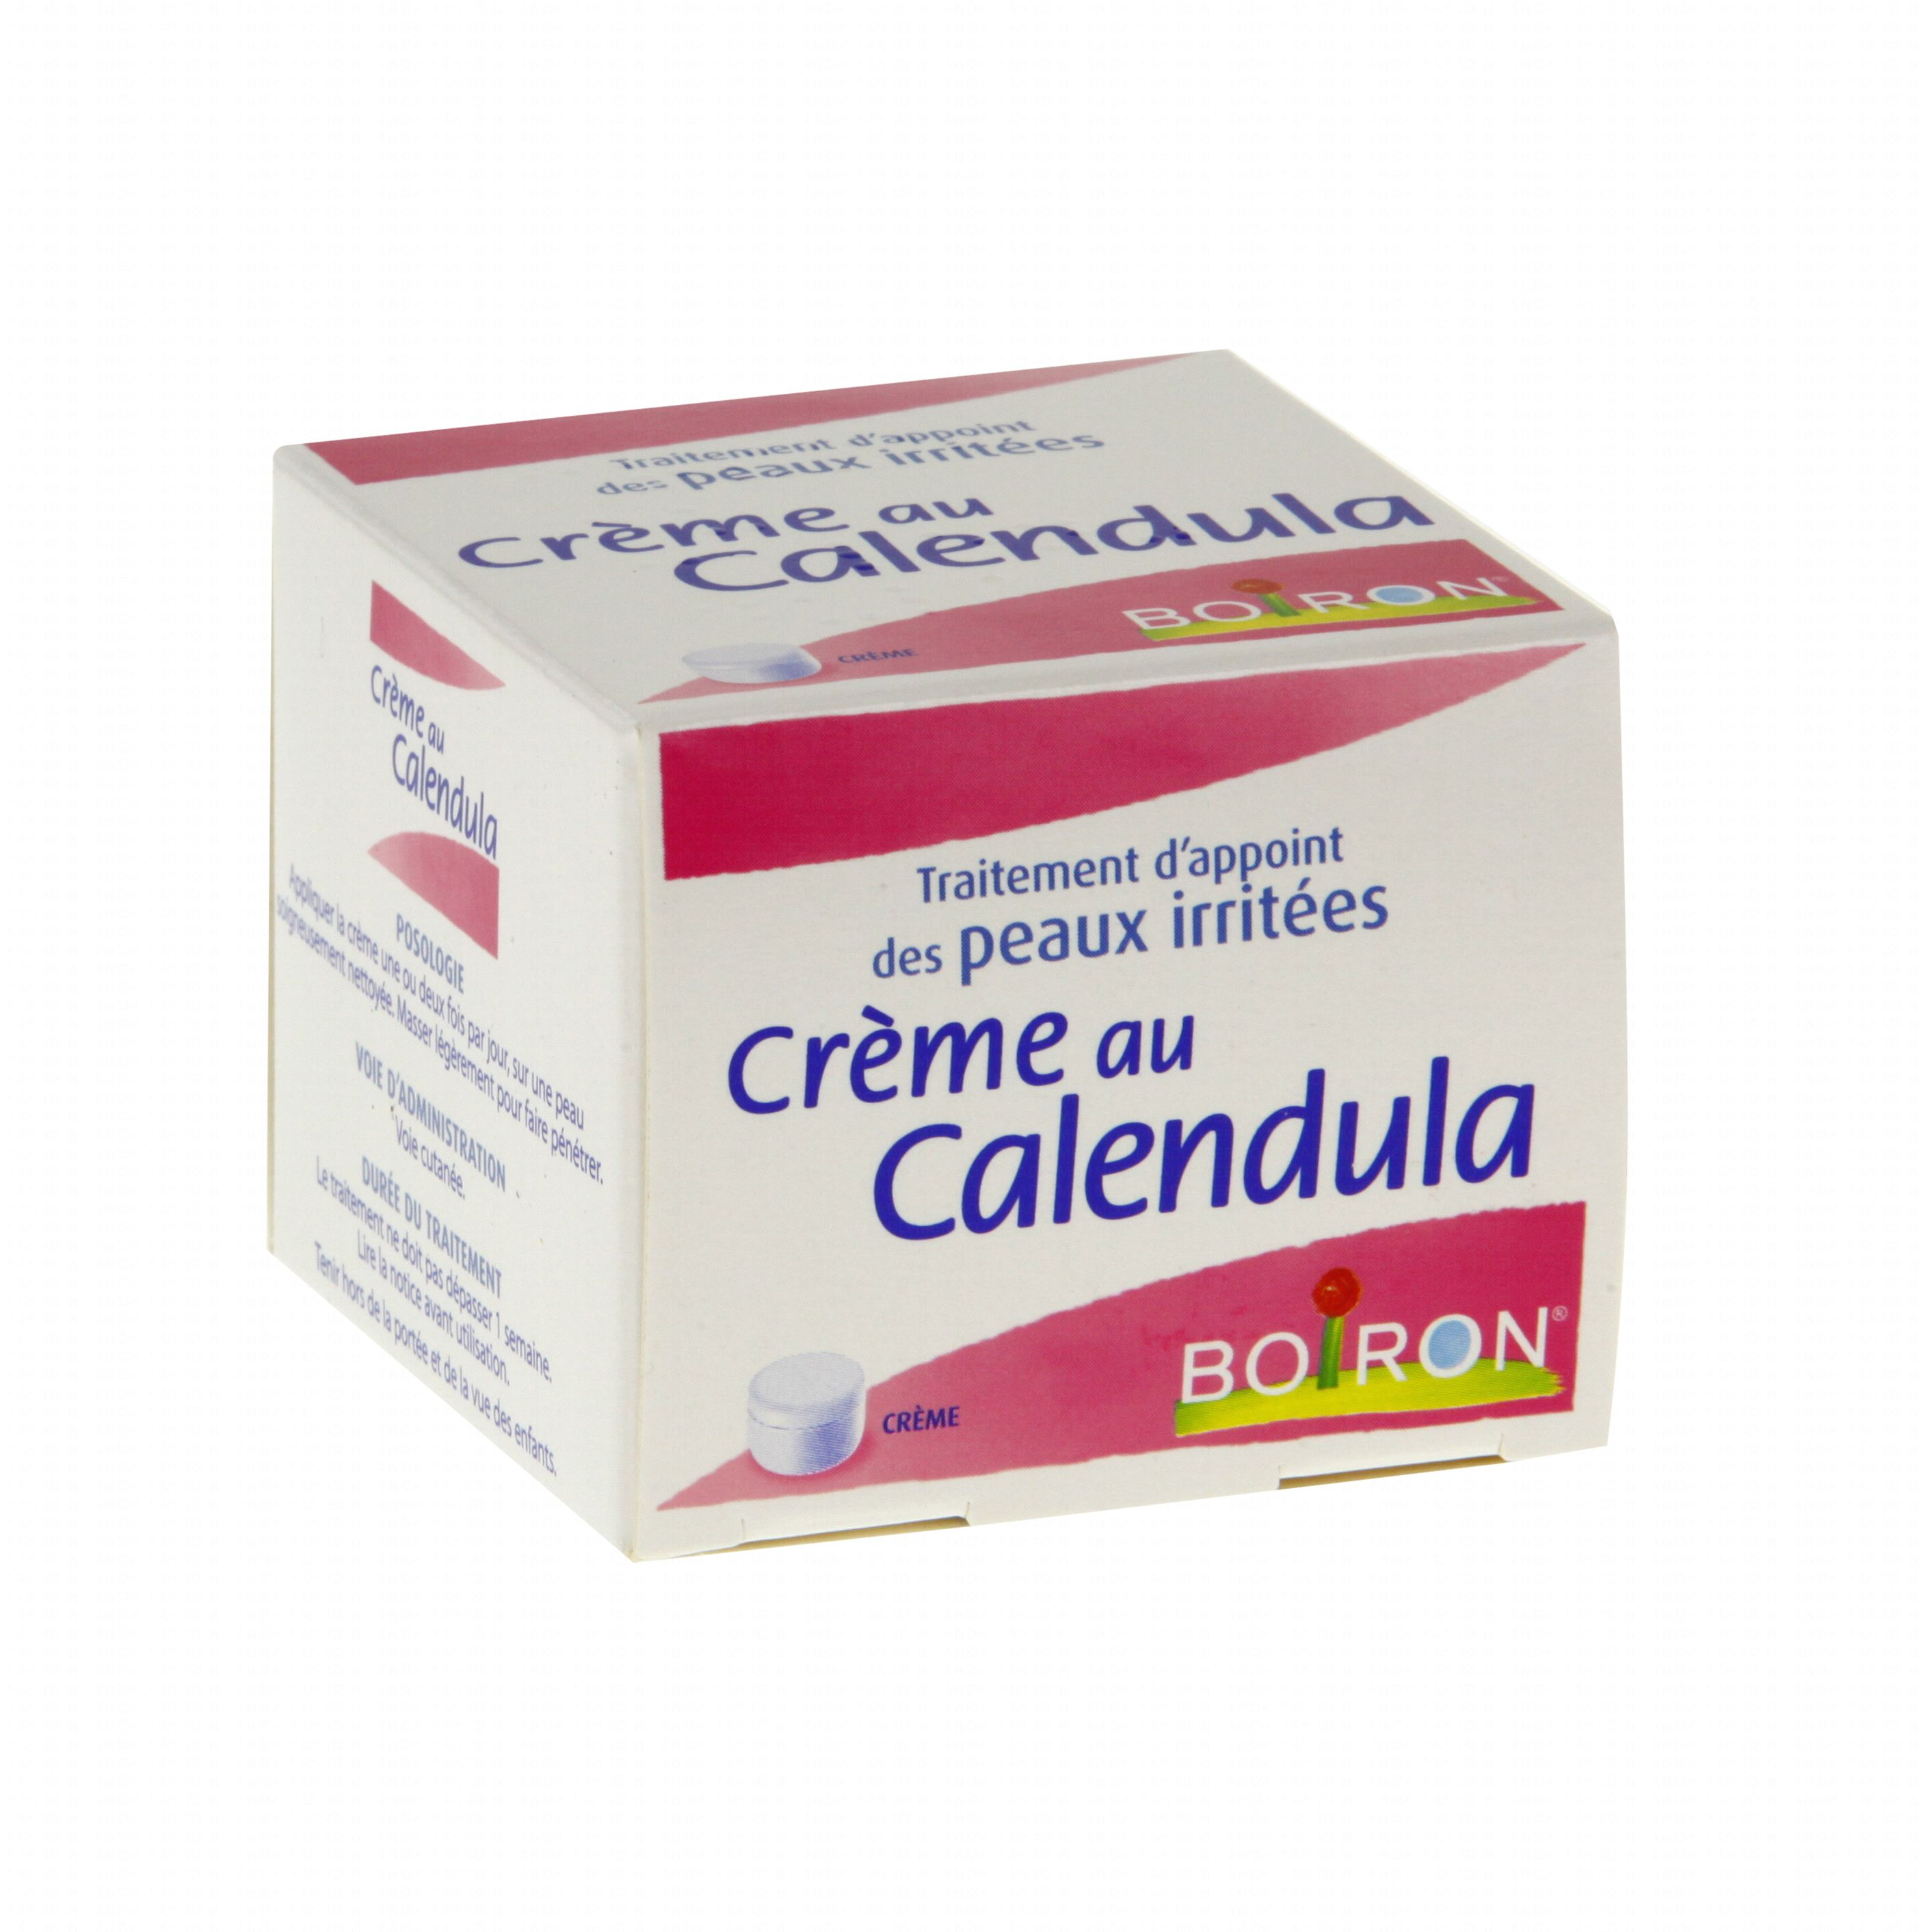 Crème au calendula pot de 20 g Boiron (médicament conseil